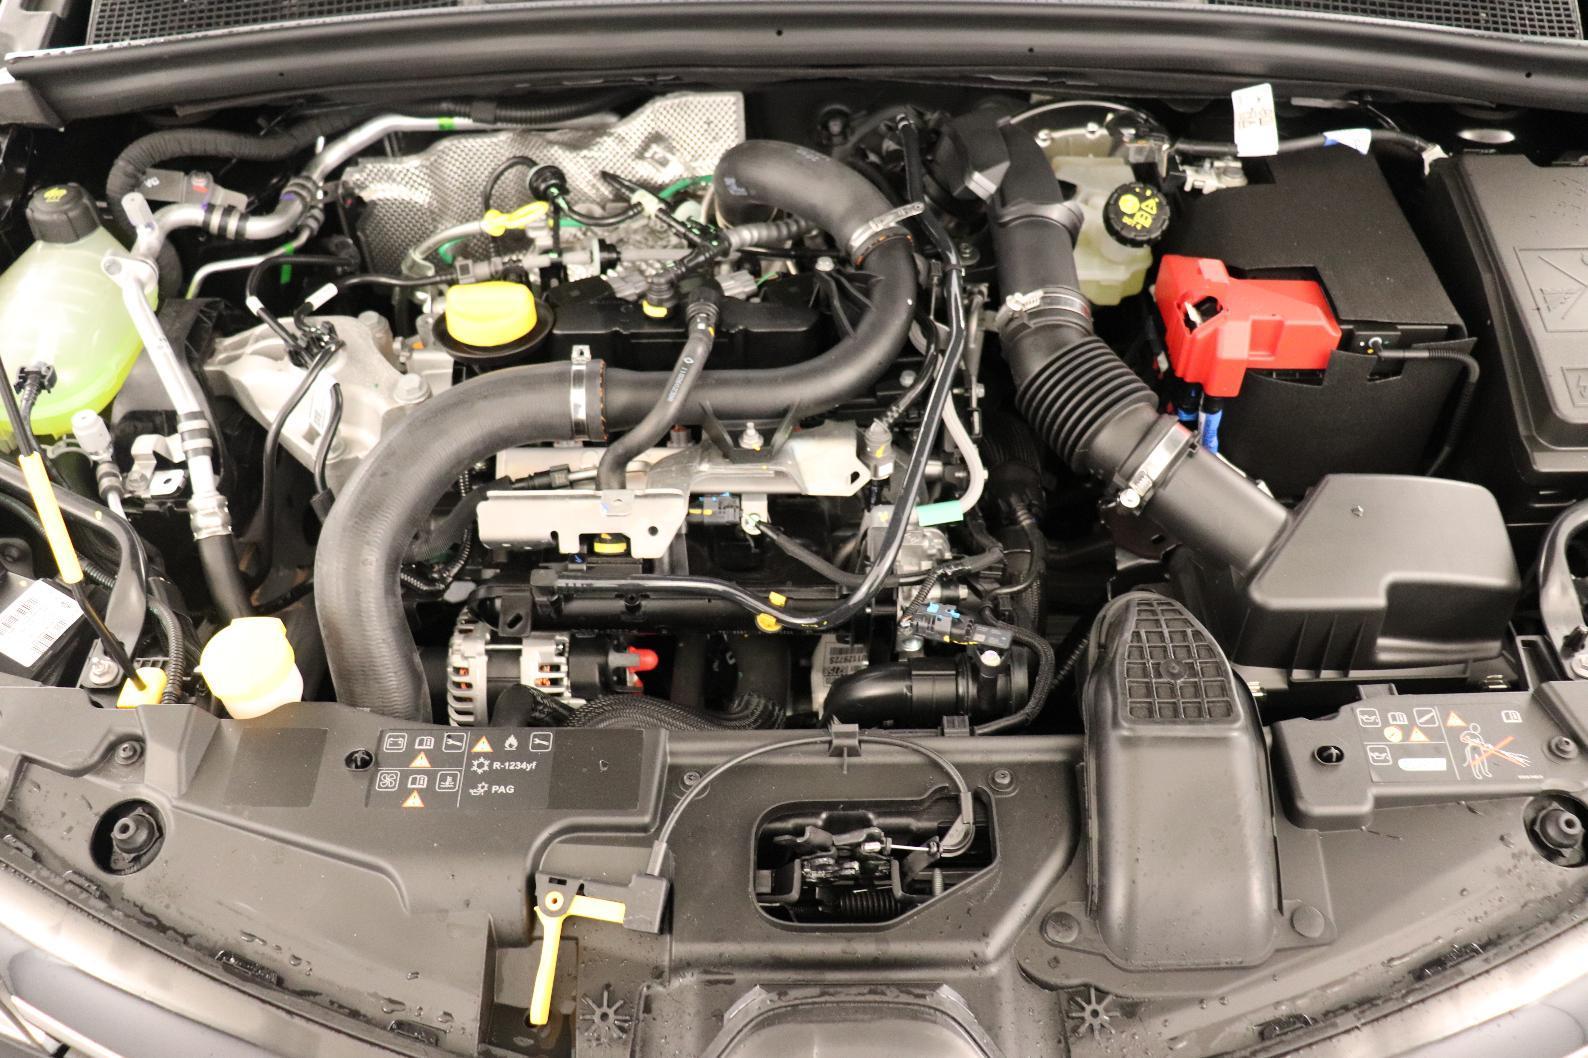 RENAULT CLIO V CLIO V 1.0 TCE 100CH EDITION ONE